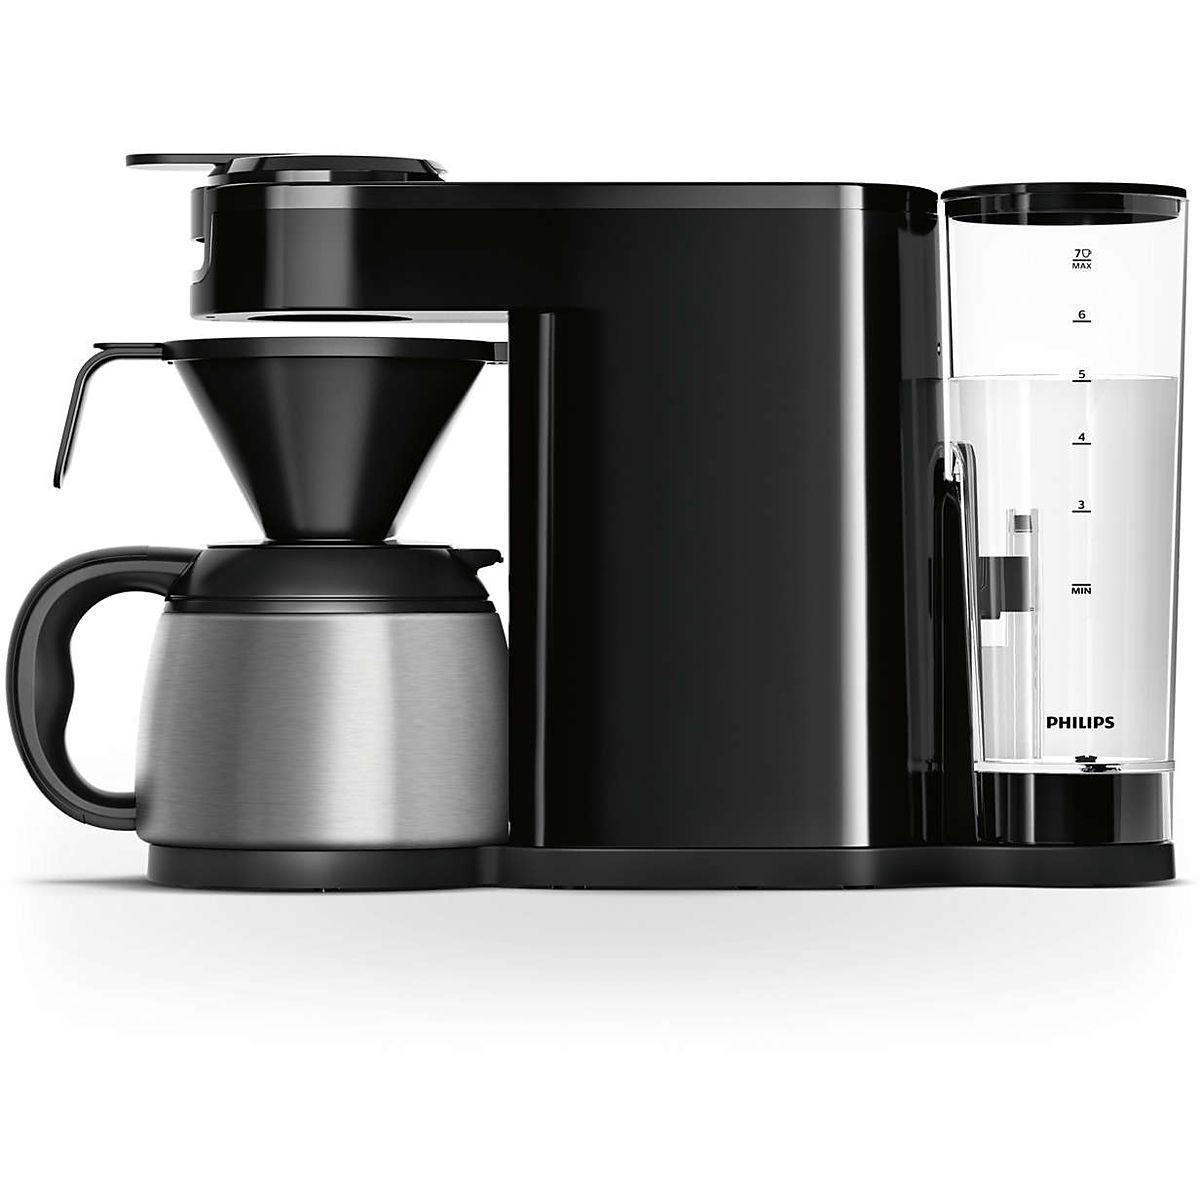 Senseo switch pad und filterkaffeemaschine hd7892 60 for Senseo kaffeepads angebot